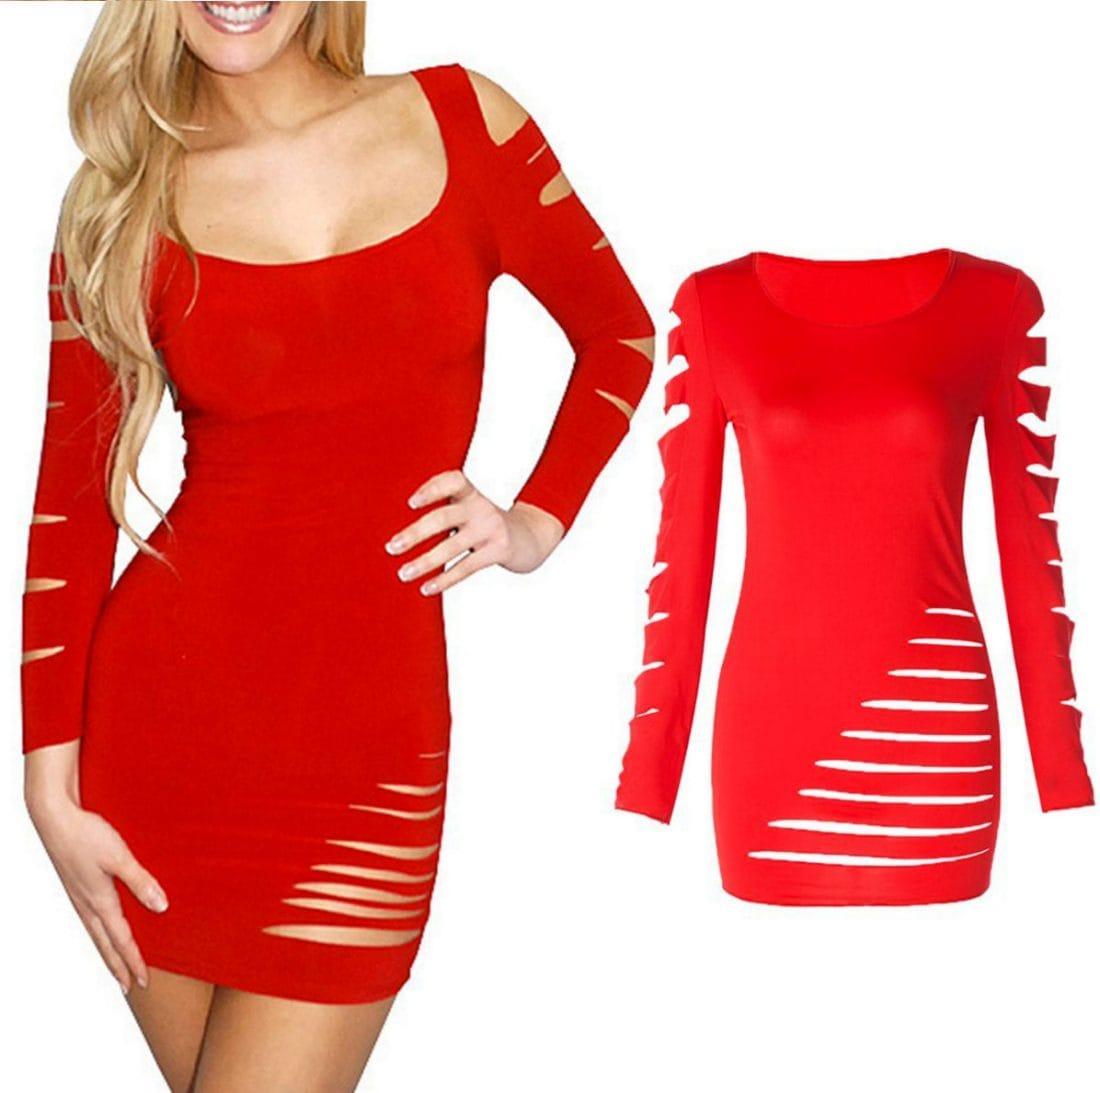 M0158 red1 Mini Dresses maureens.com boutique